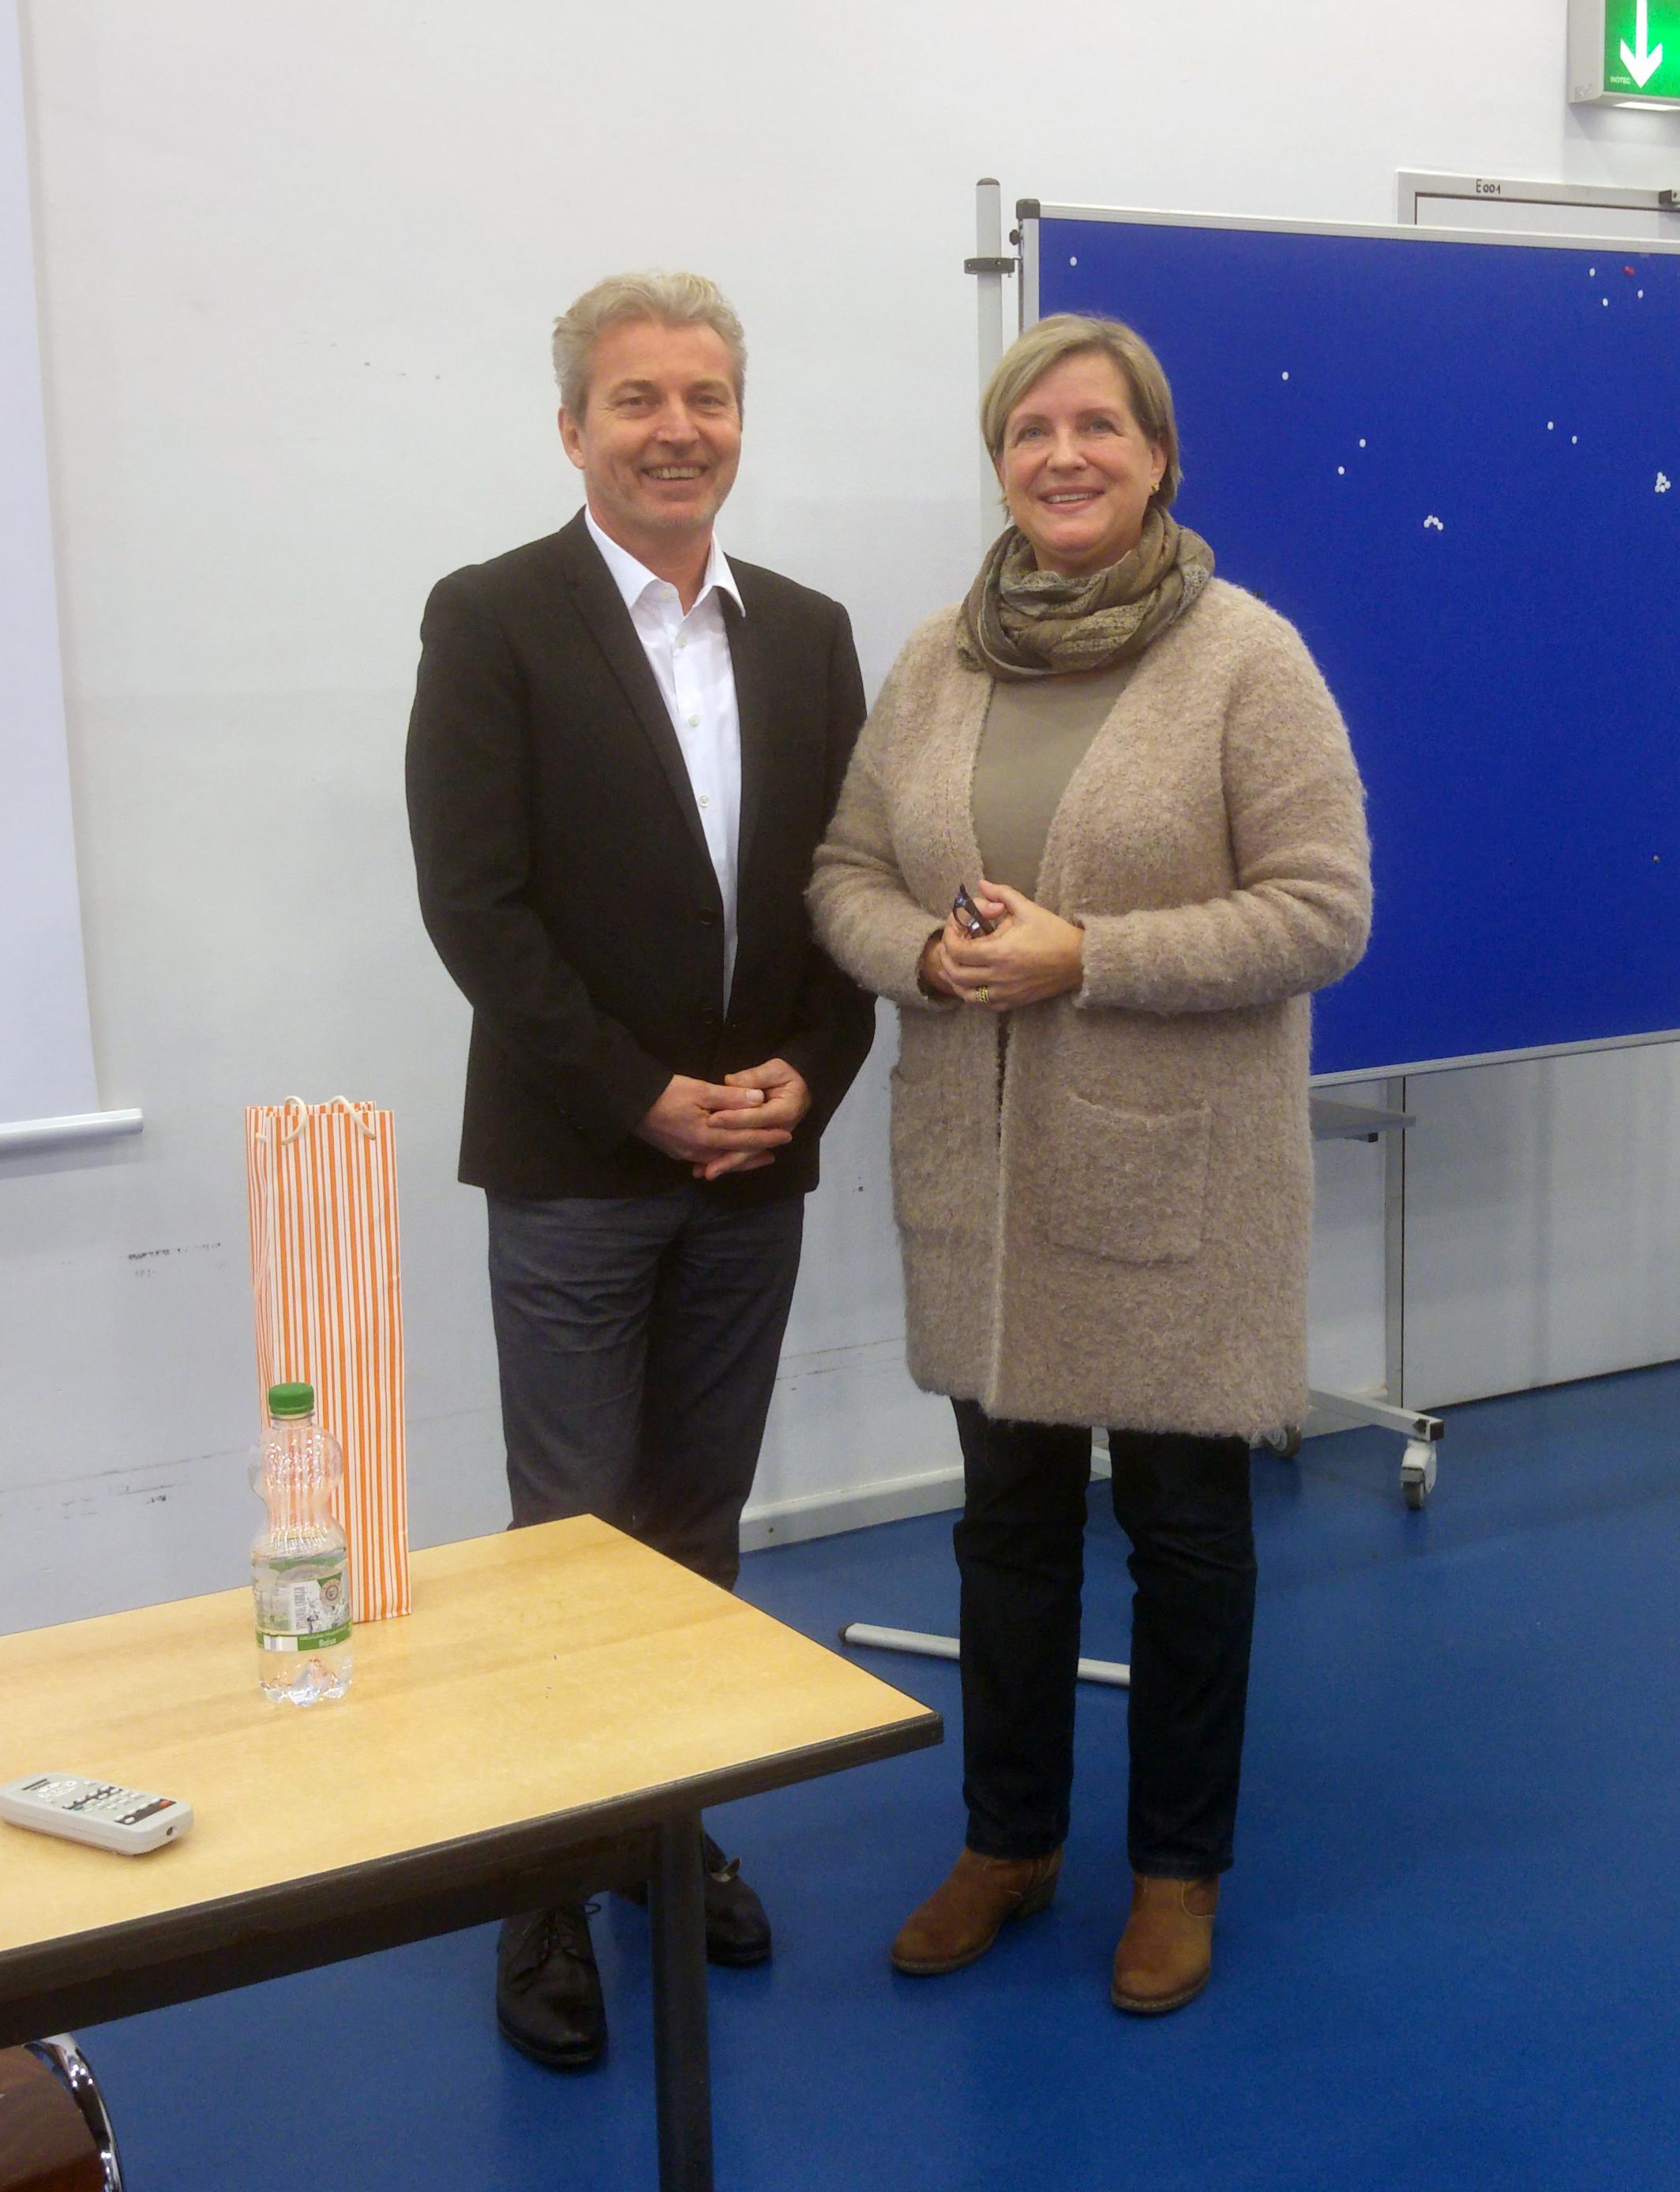 Dr Michael Winterhoff Als Gastreferent Am Hhg Helmholtz Gymnasium Bonn Schule Der Stadt Bonn